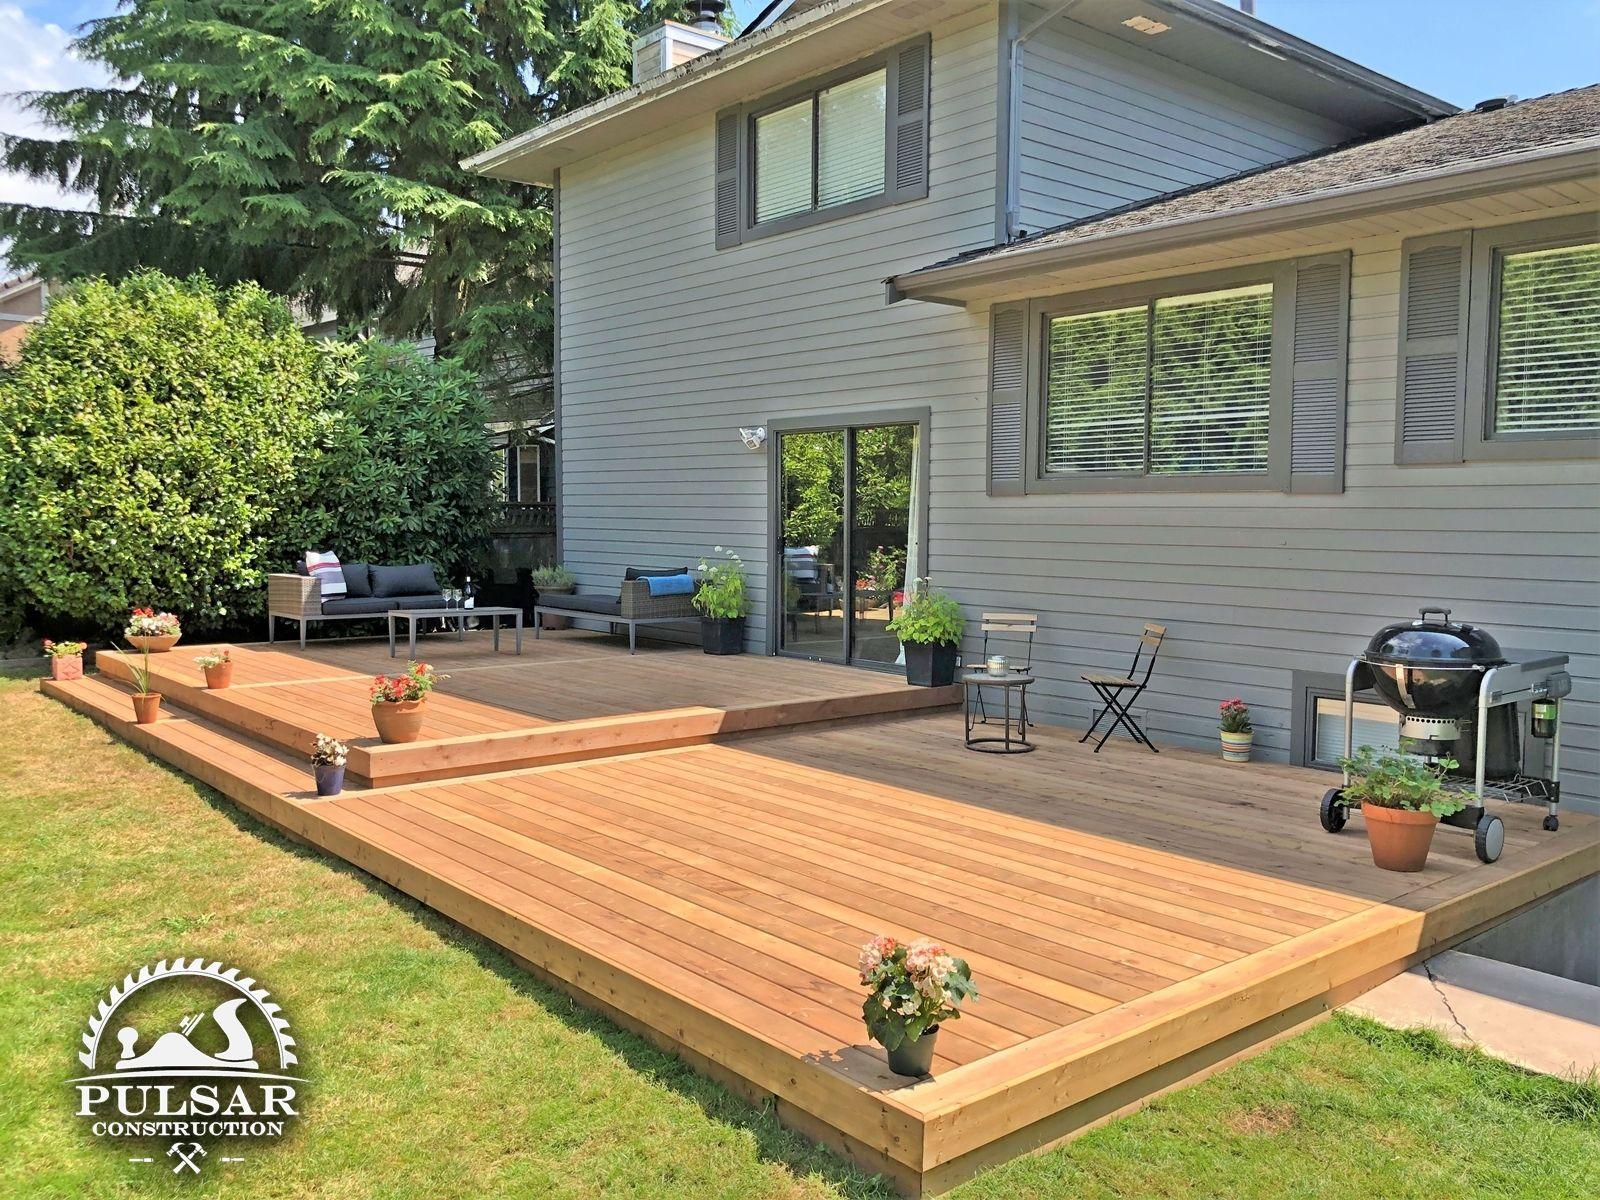 Pin On Backyard Ideas House backyard deck ideas